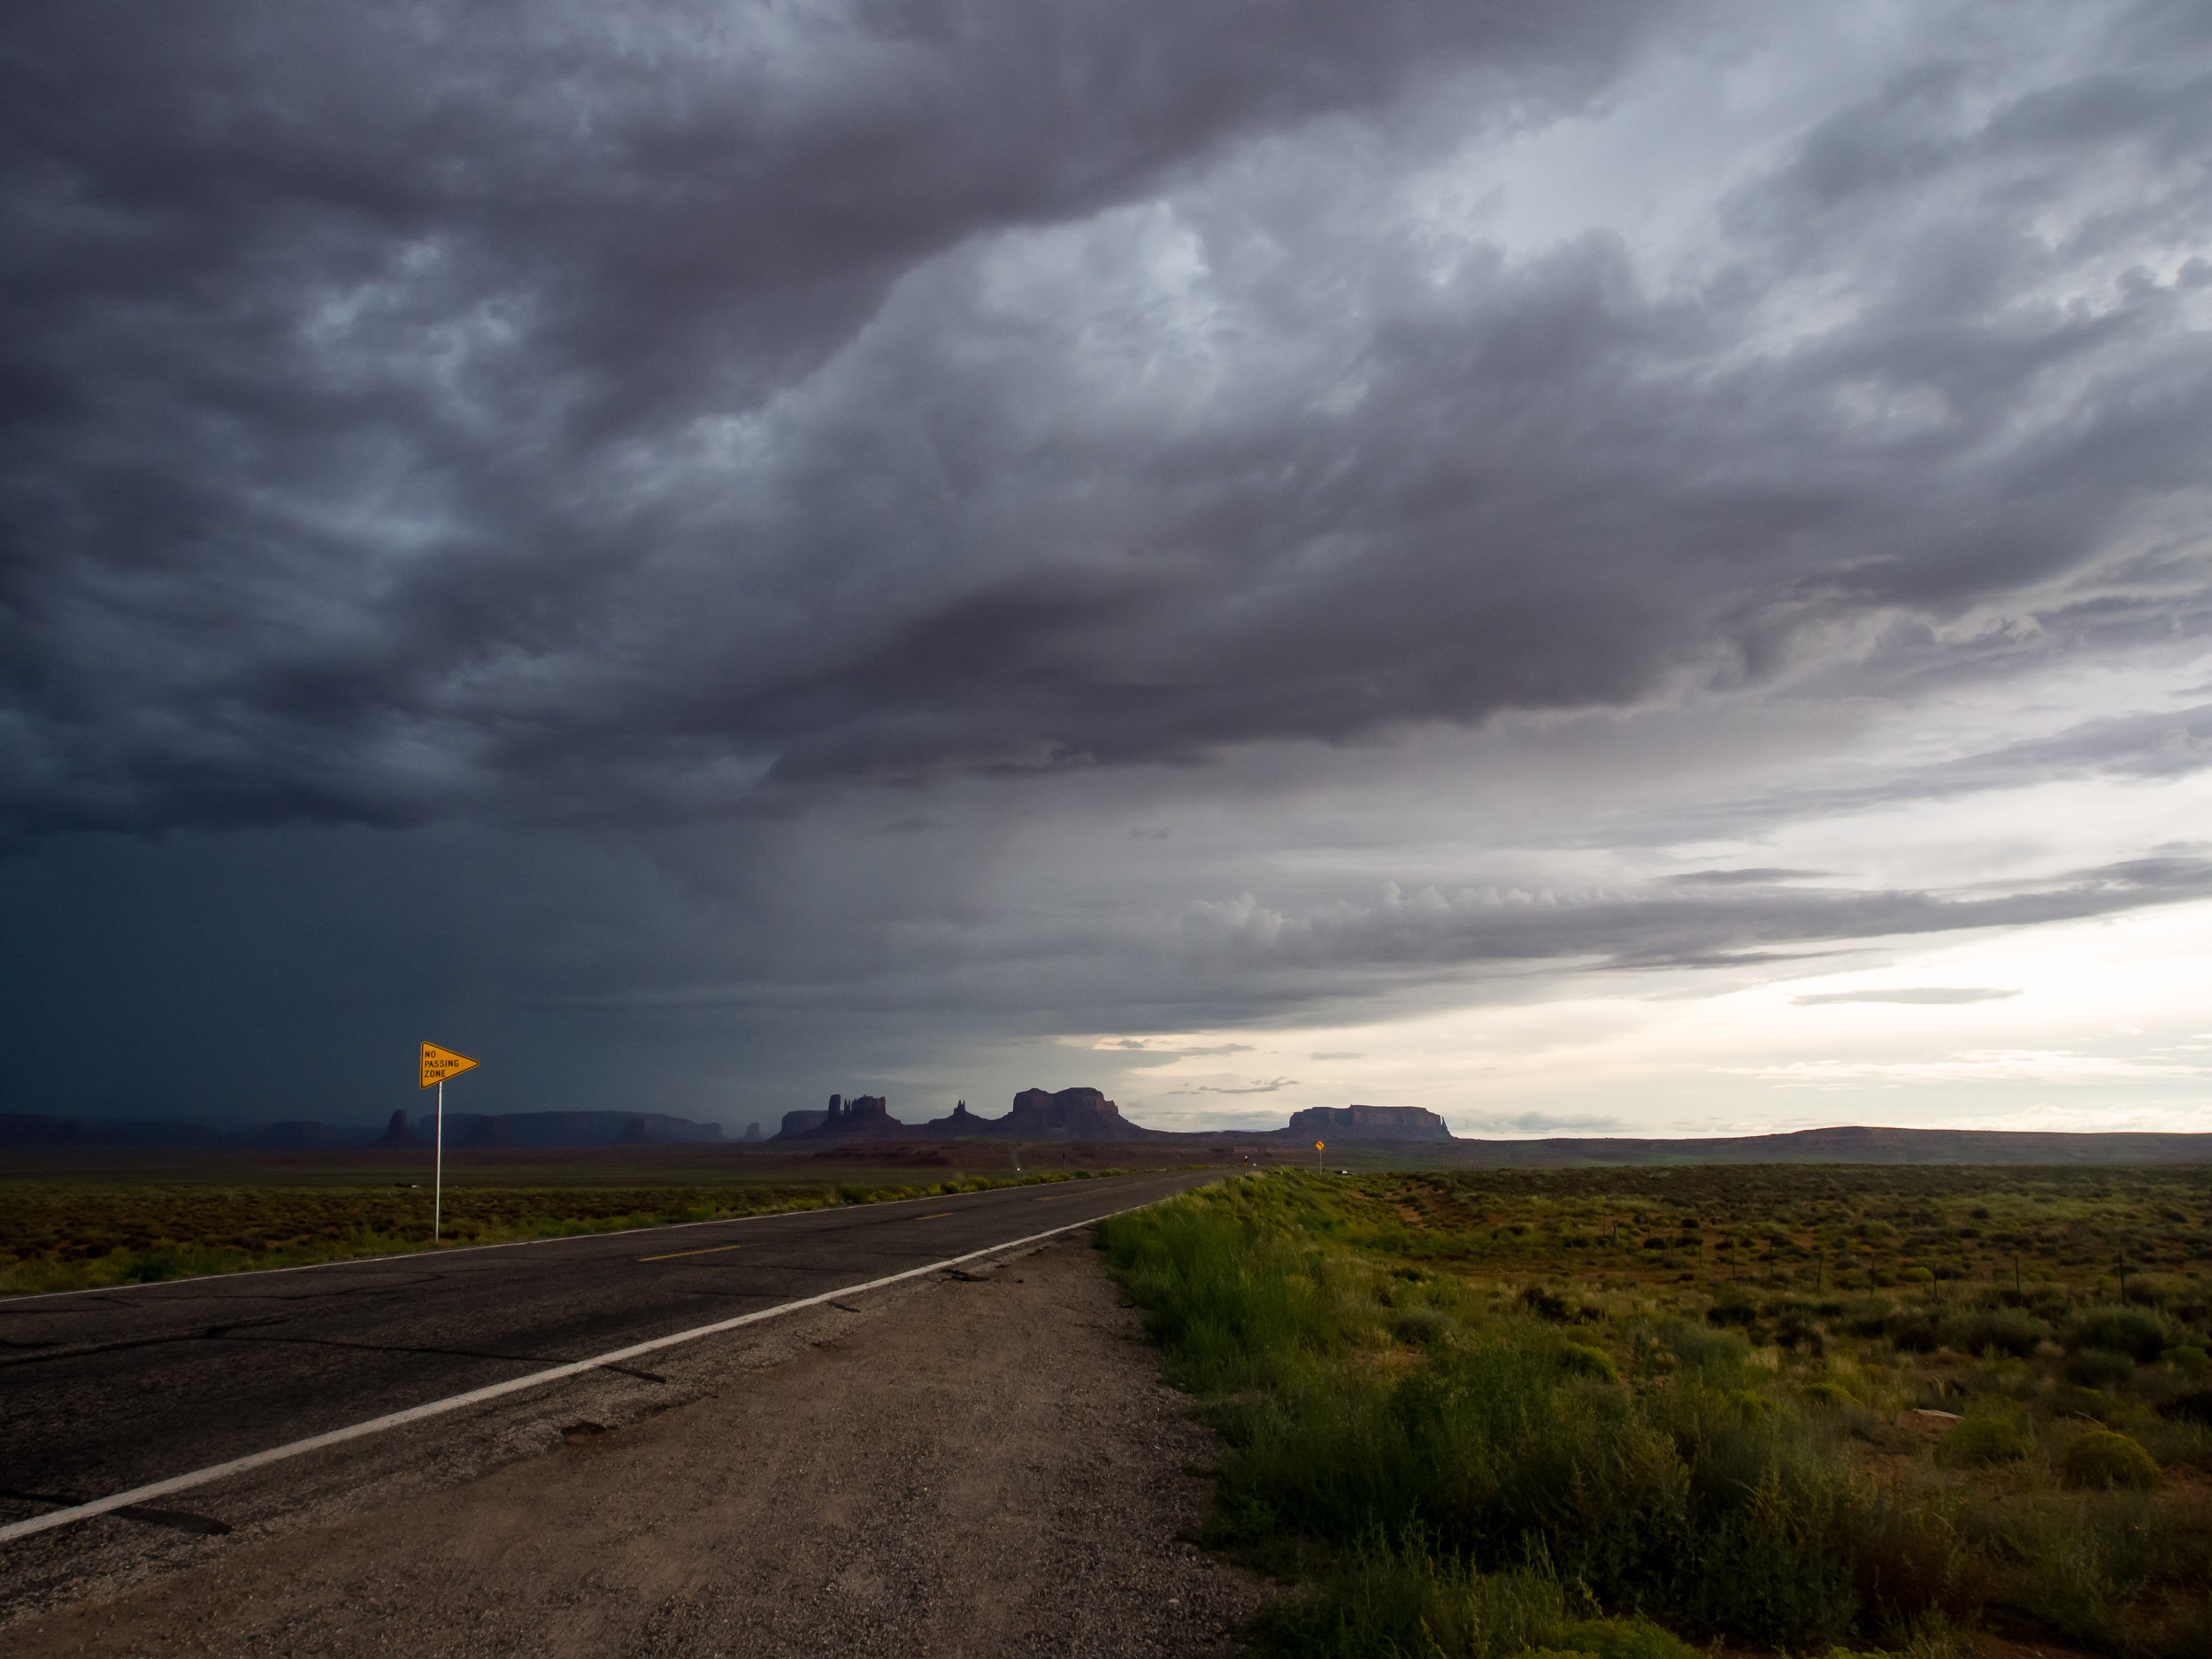 Monument Valley on the horizon.